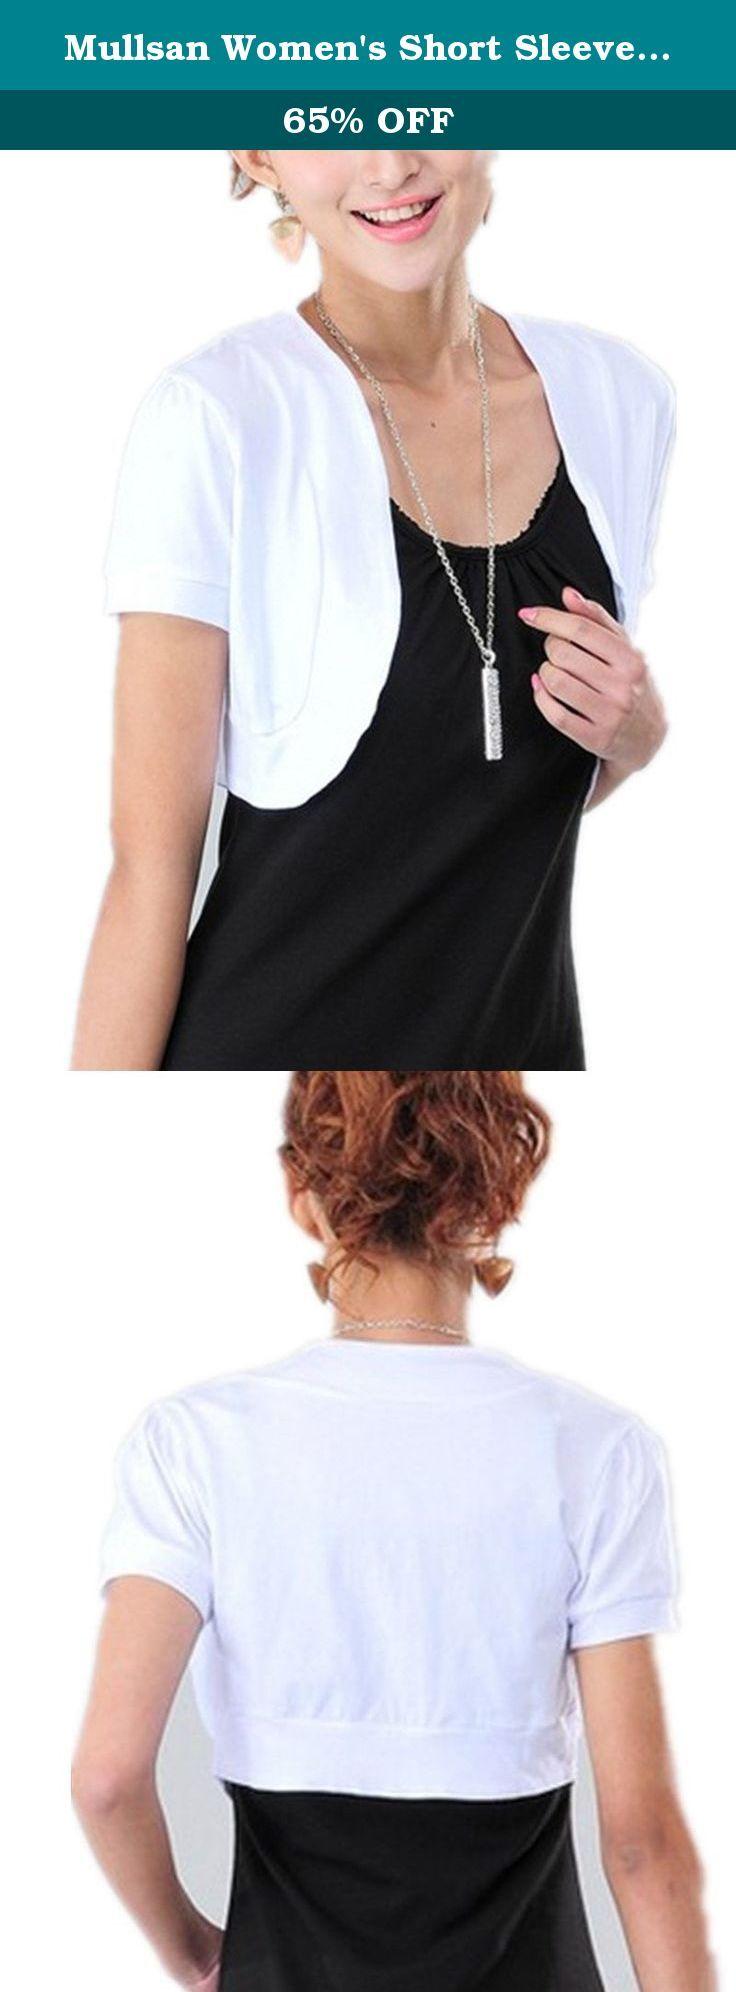 Mullsan Women's Short Sleeve Shrug Cardigan Top (White). Pair this ...